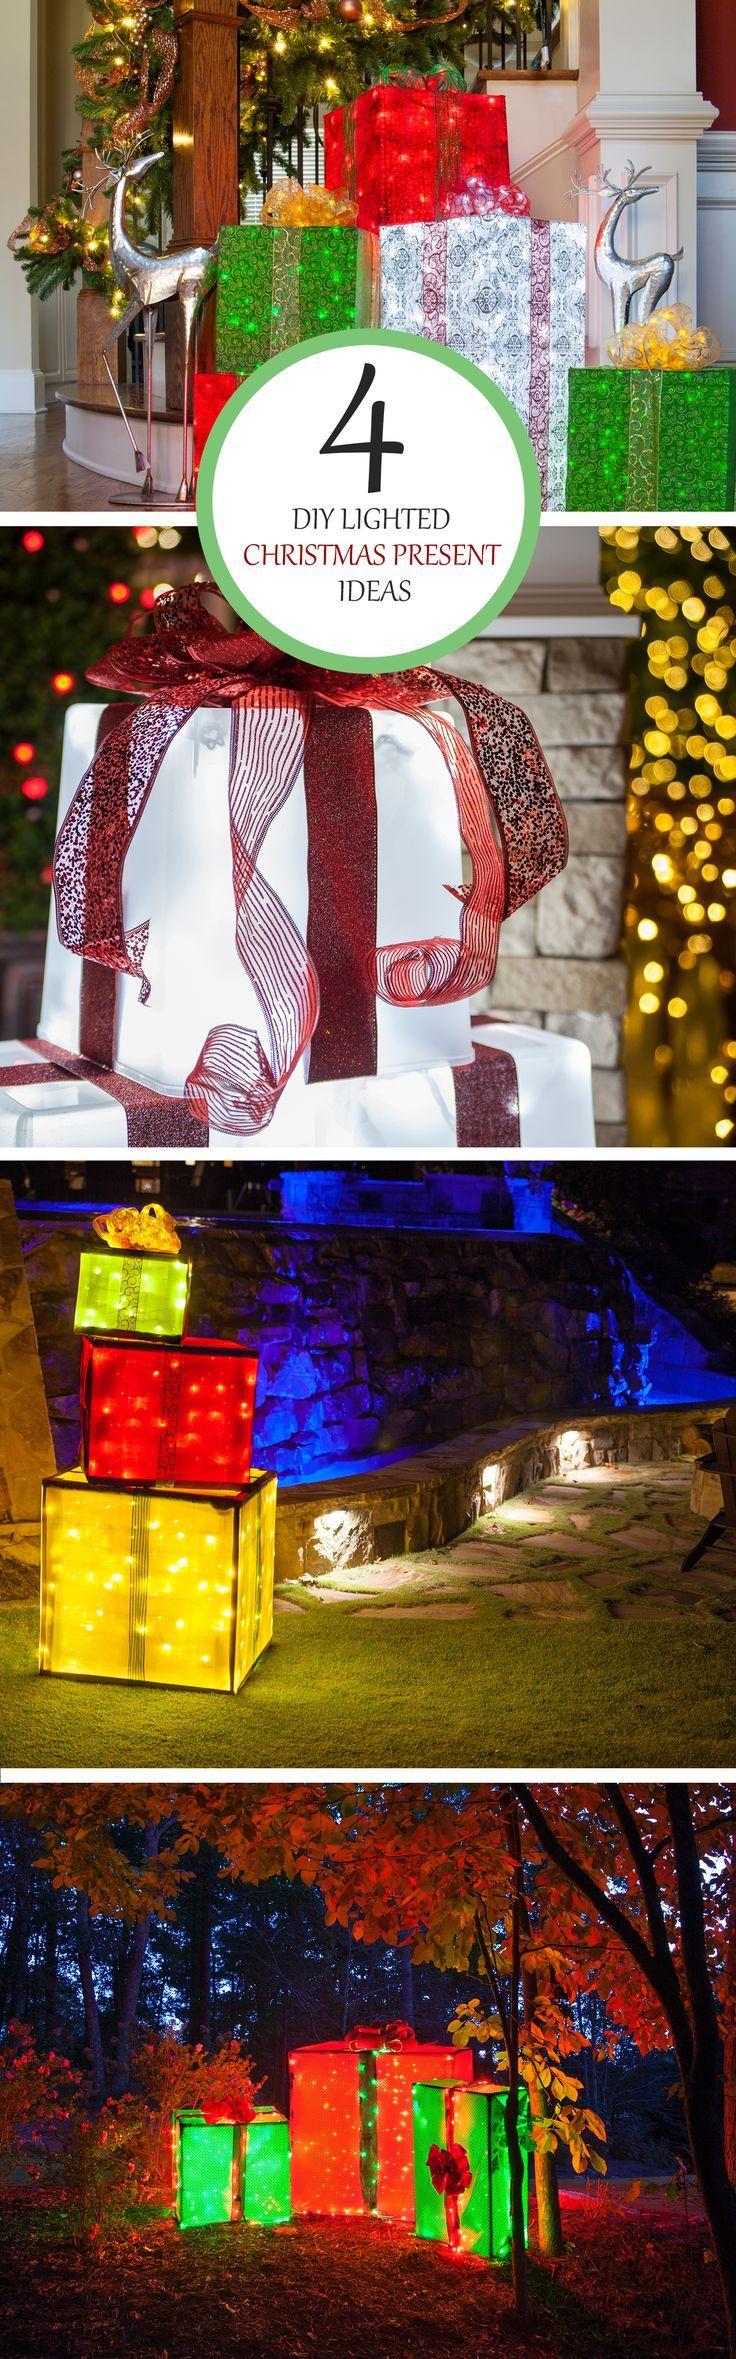 Diy outdoor christmas decorations  DIY Christmas Decorations   Lighted Gift Boxes  Outdoor christmas